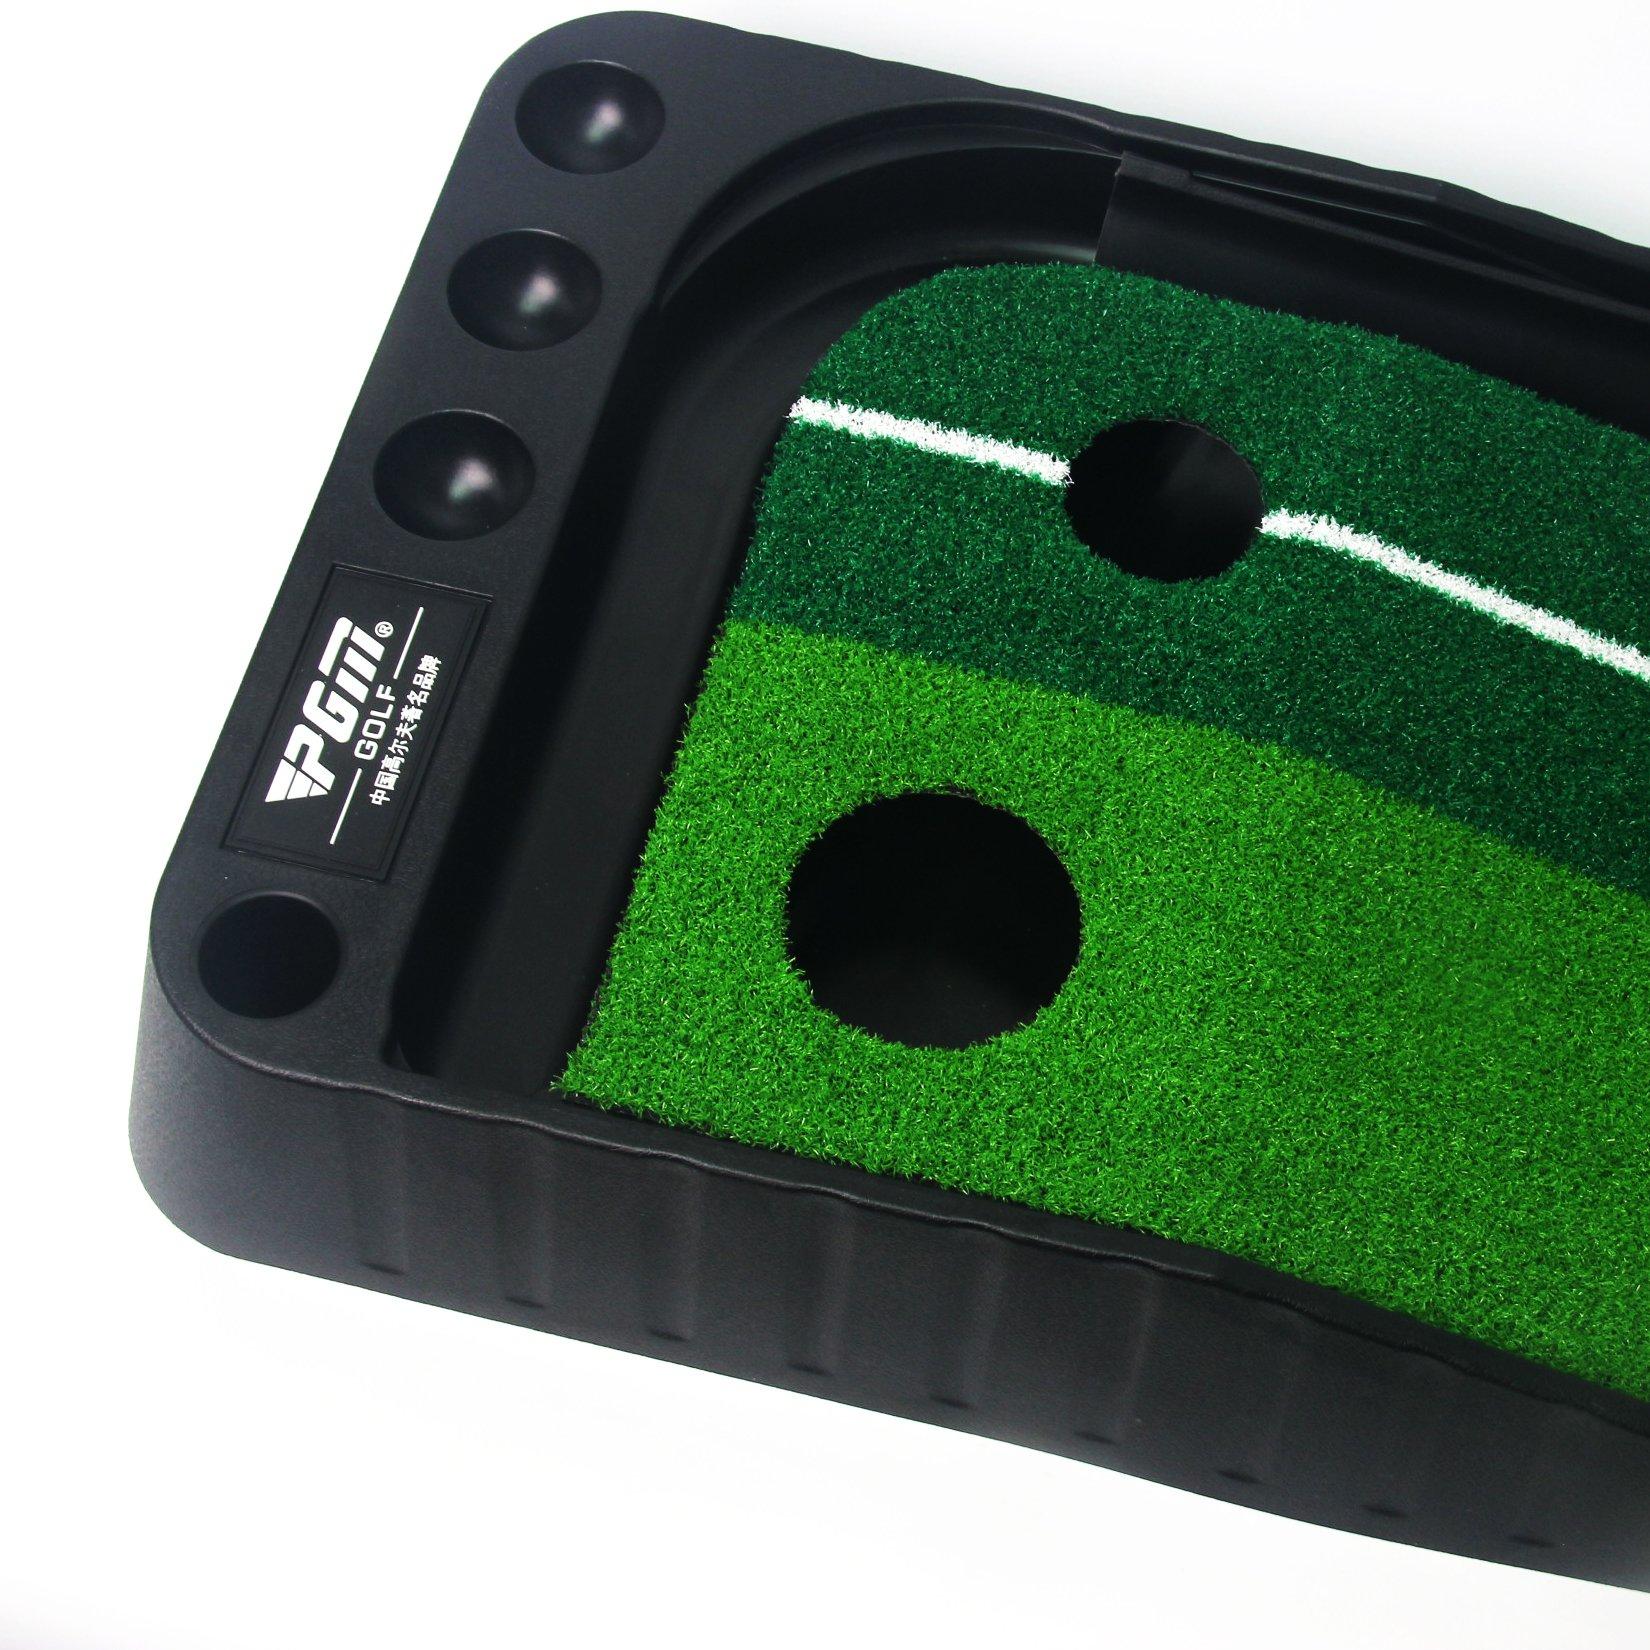 Signstek Indoor Outdoor Golf Auto Return Putting Trainer Mat by Signstek (Image #7)